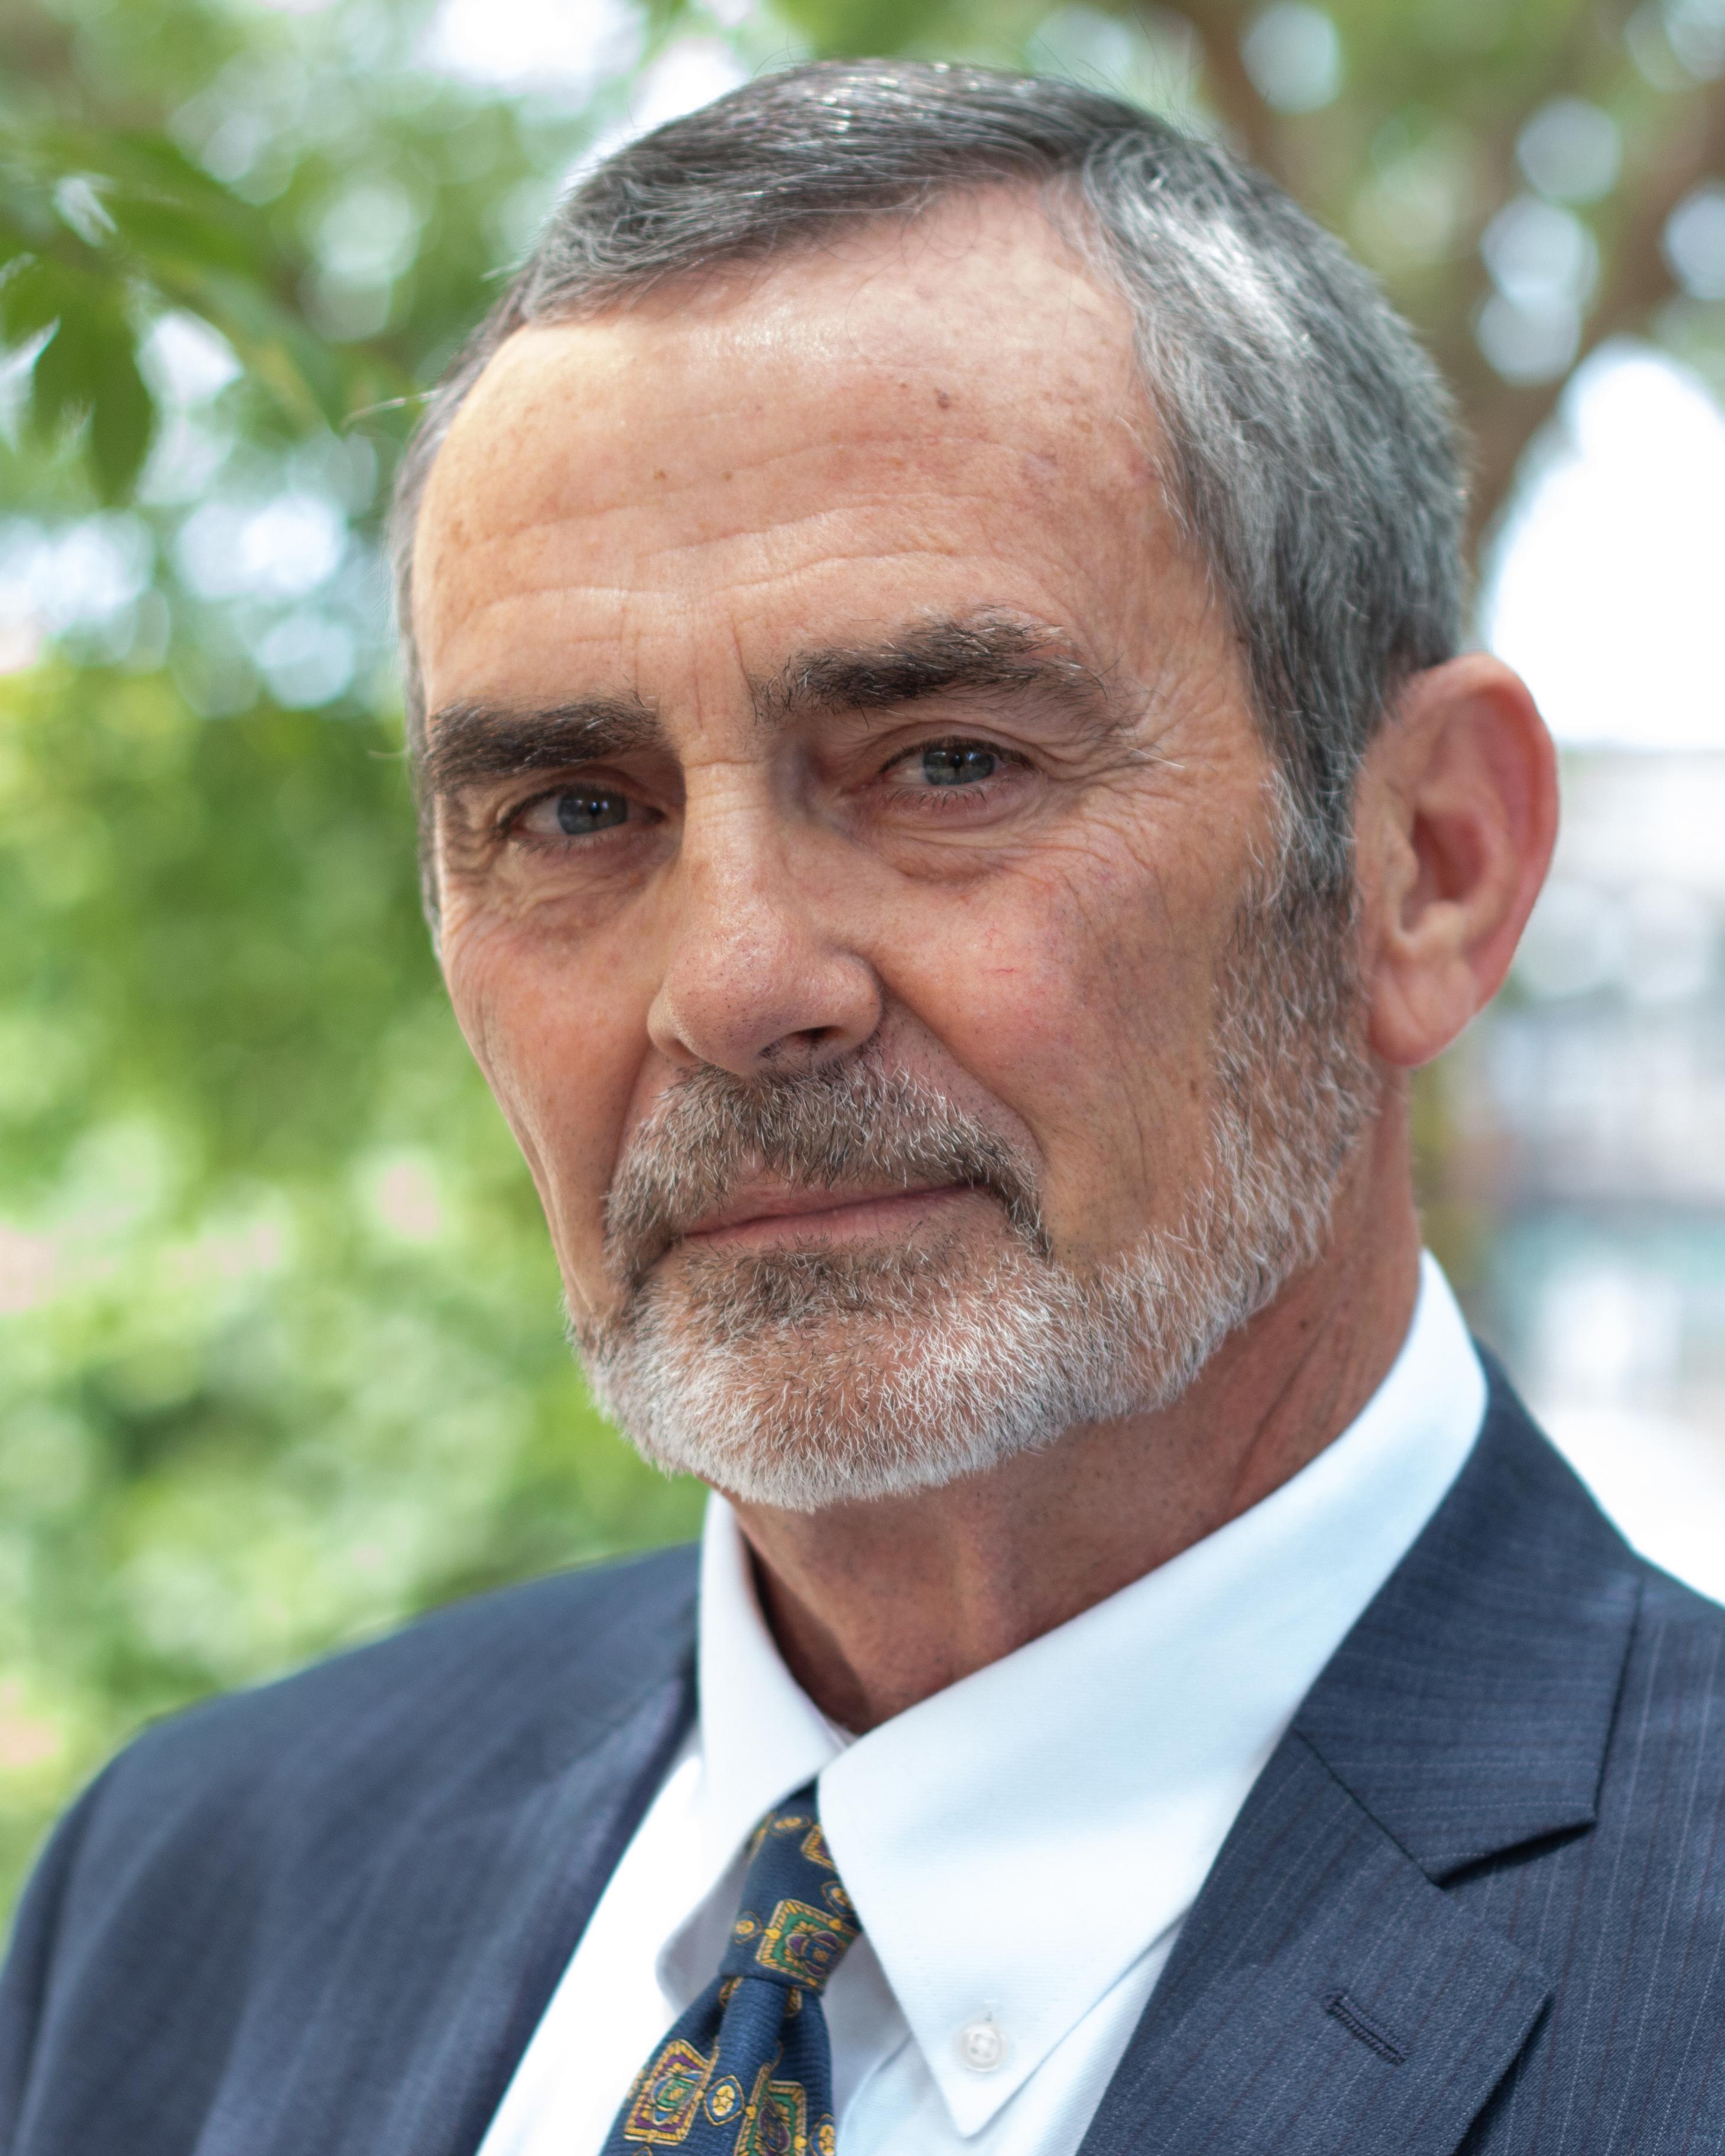 President Harold Perrin